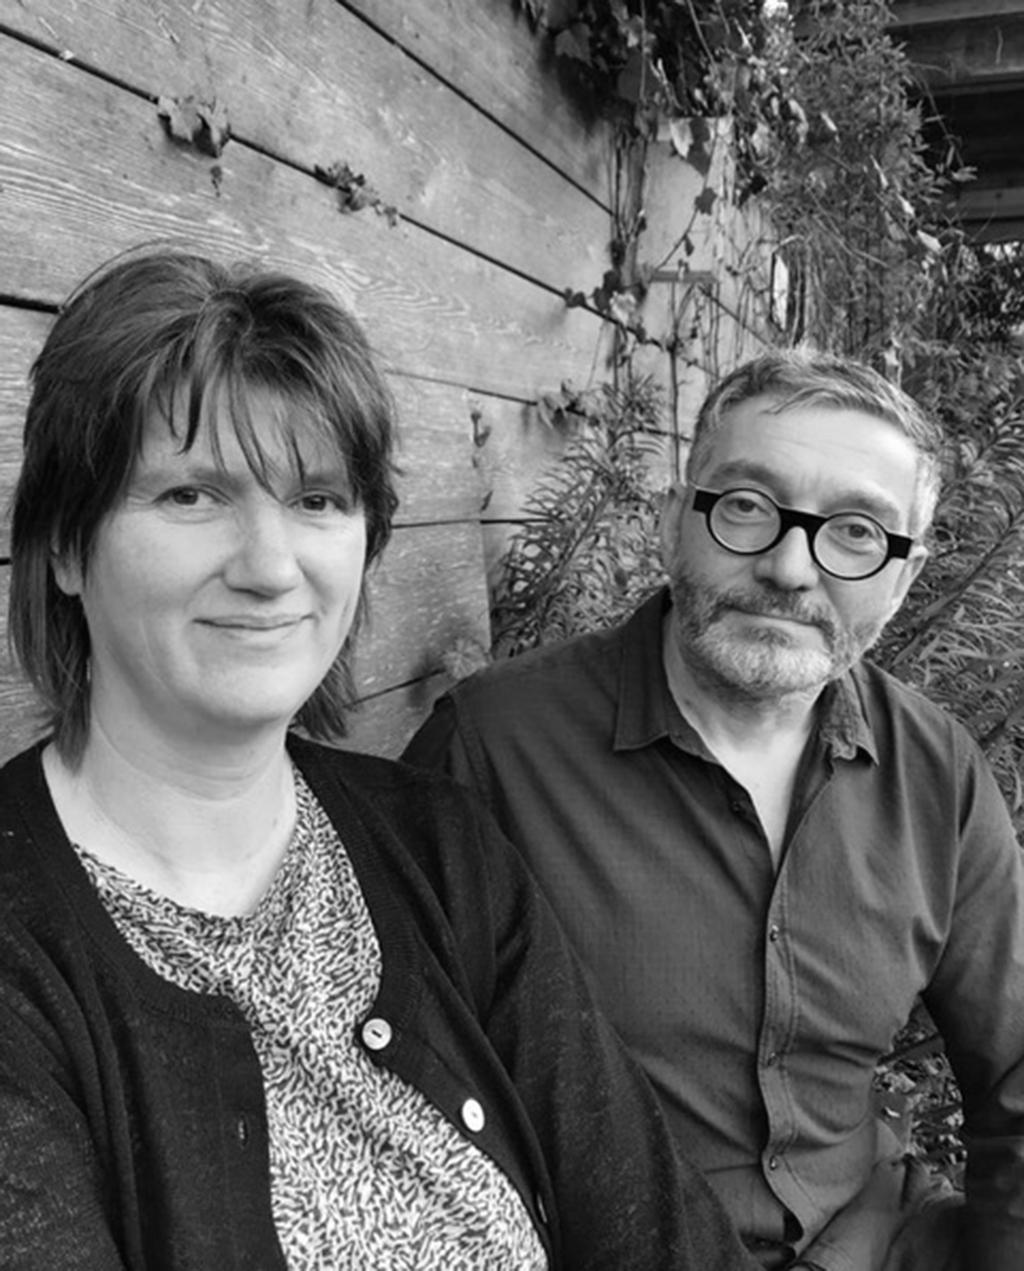 vtwonen tuin special 1 | Portretfoto Margo van Beem en Emiel